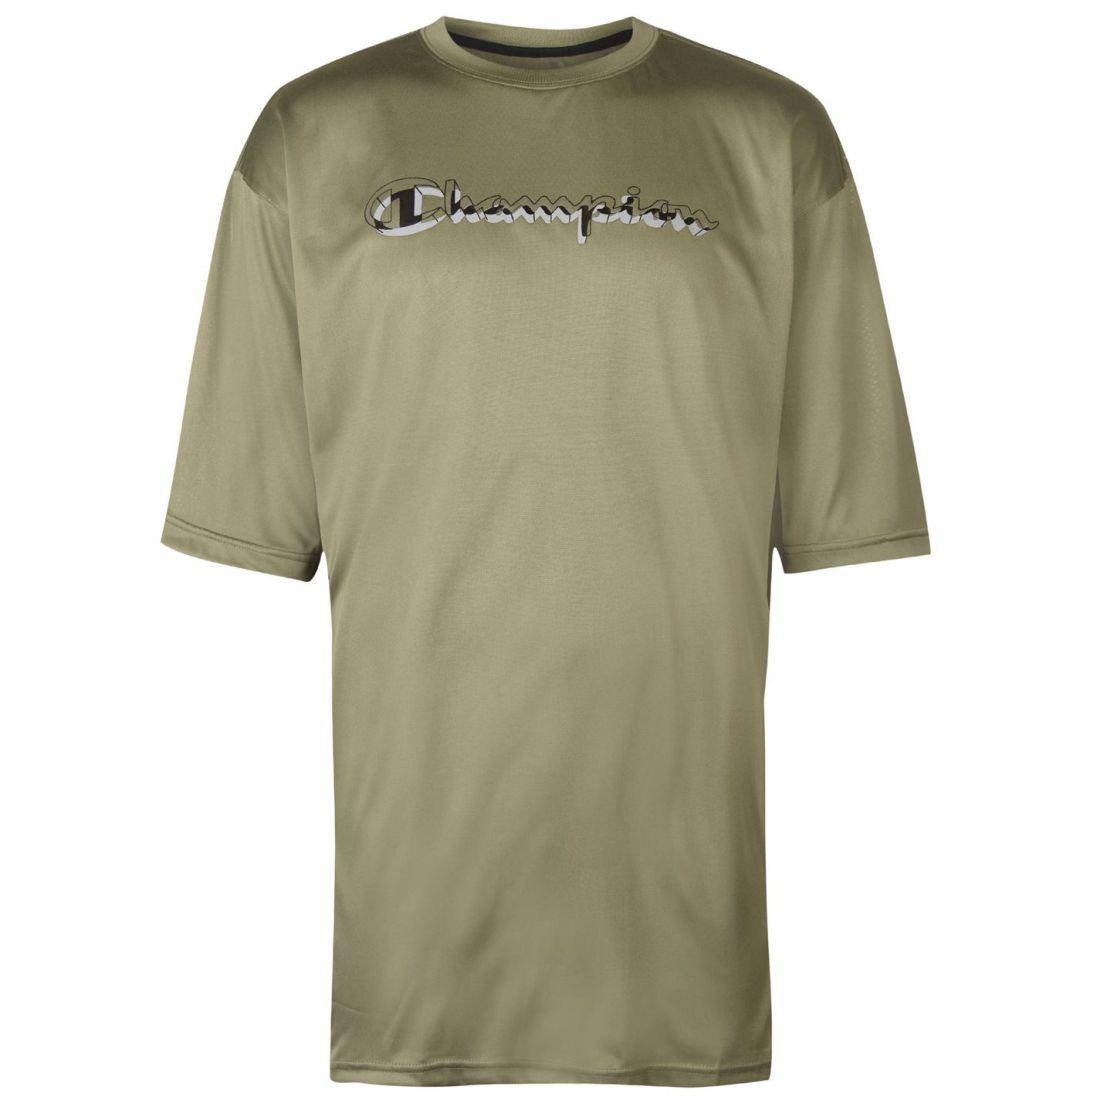 abc223f962d0 Champion Print Logo Mens Short Sleeve T-Shirt Green Crew Neck Top Fashion  Sports Shirts